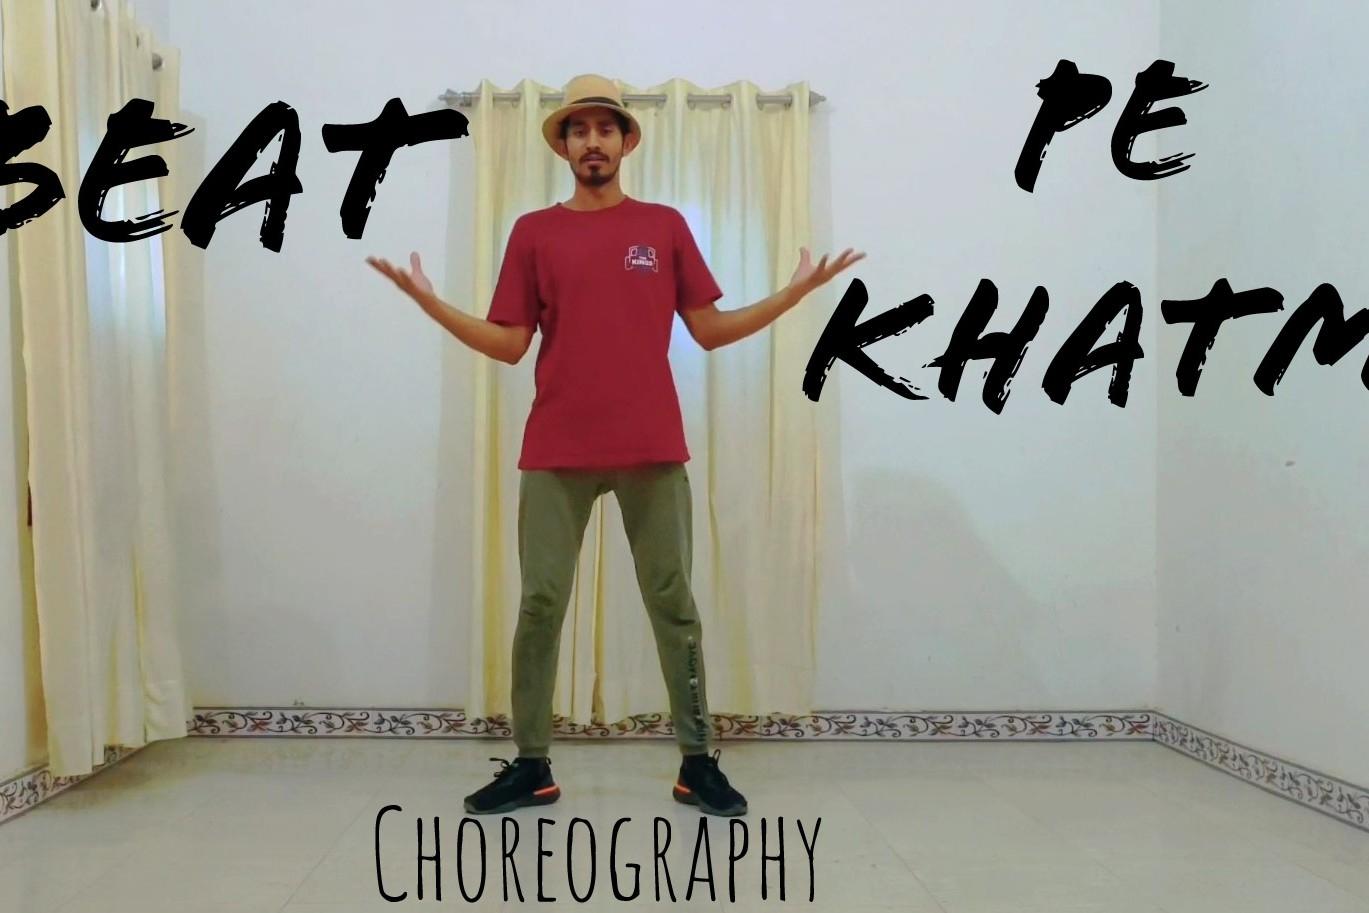 Beat pe khatm -Dance|| Choreography by Goswami